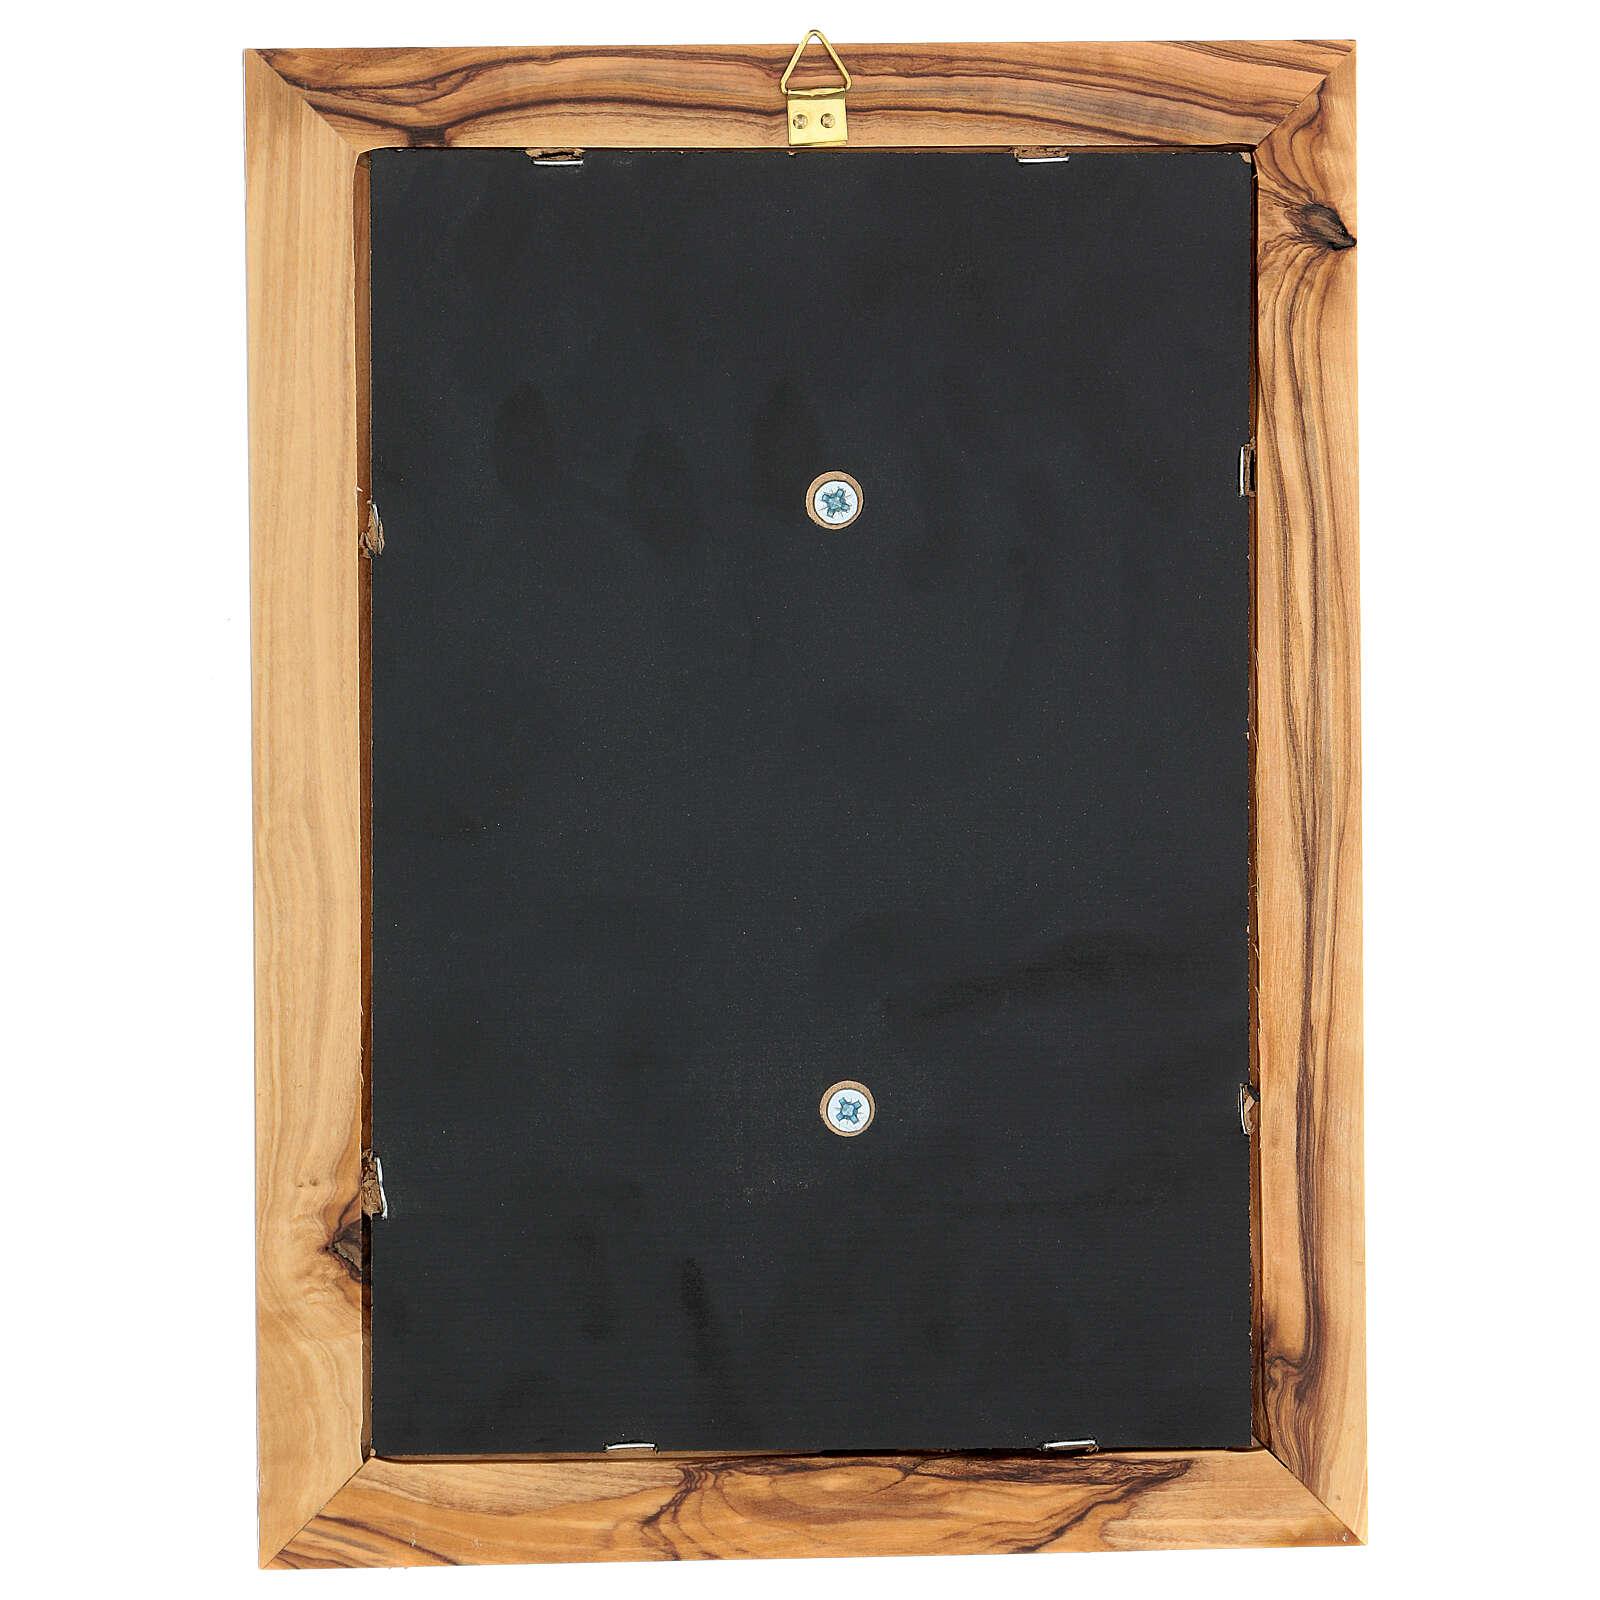 Cornice Maria rilievo legno ulivo Betlemme 25x18 cm 3